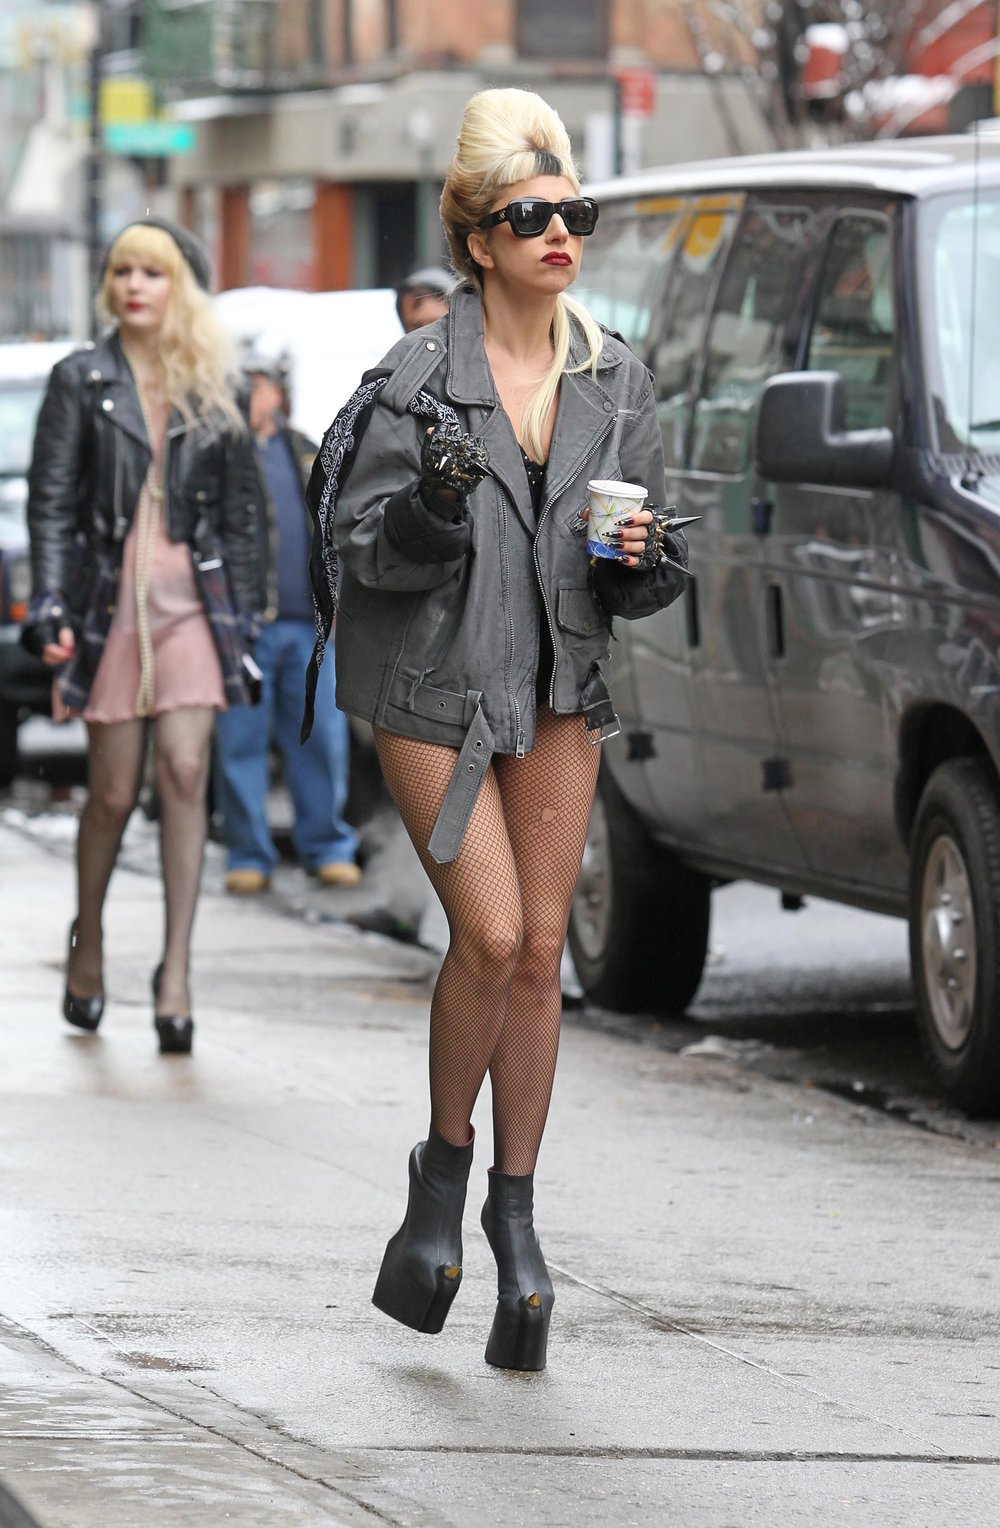 A-Morir Lady Gaga Gloves HBO special.jpg